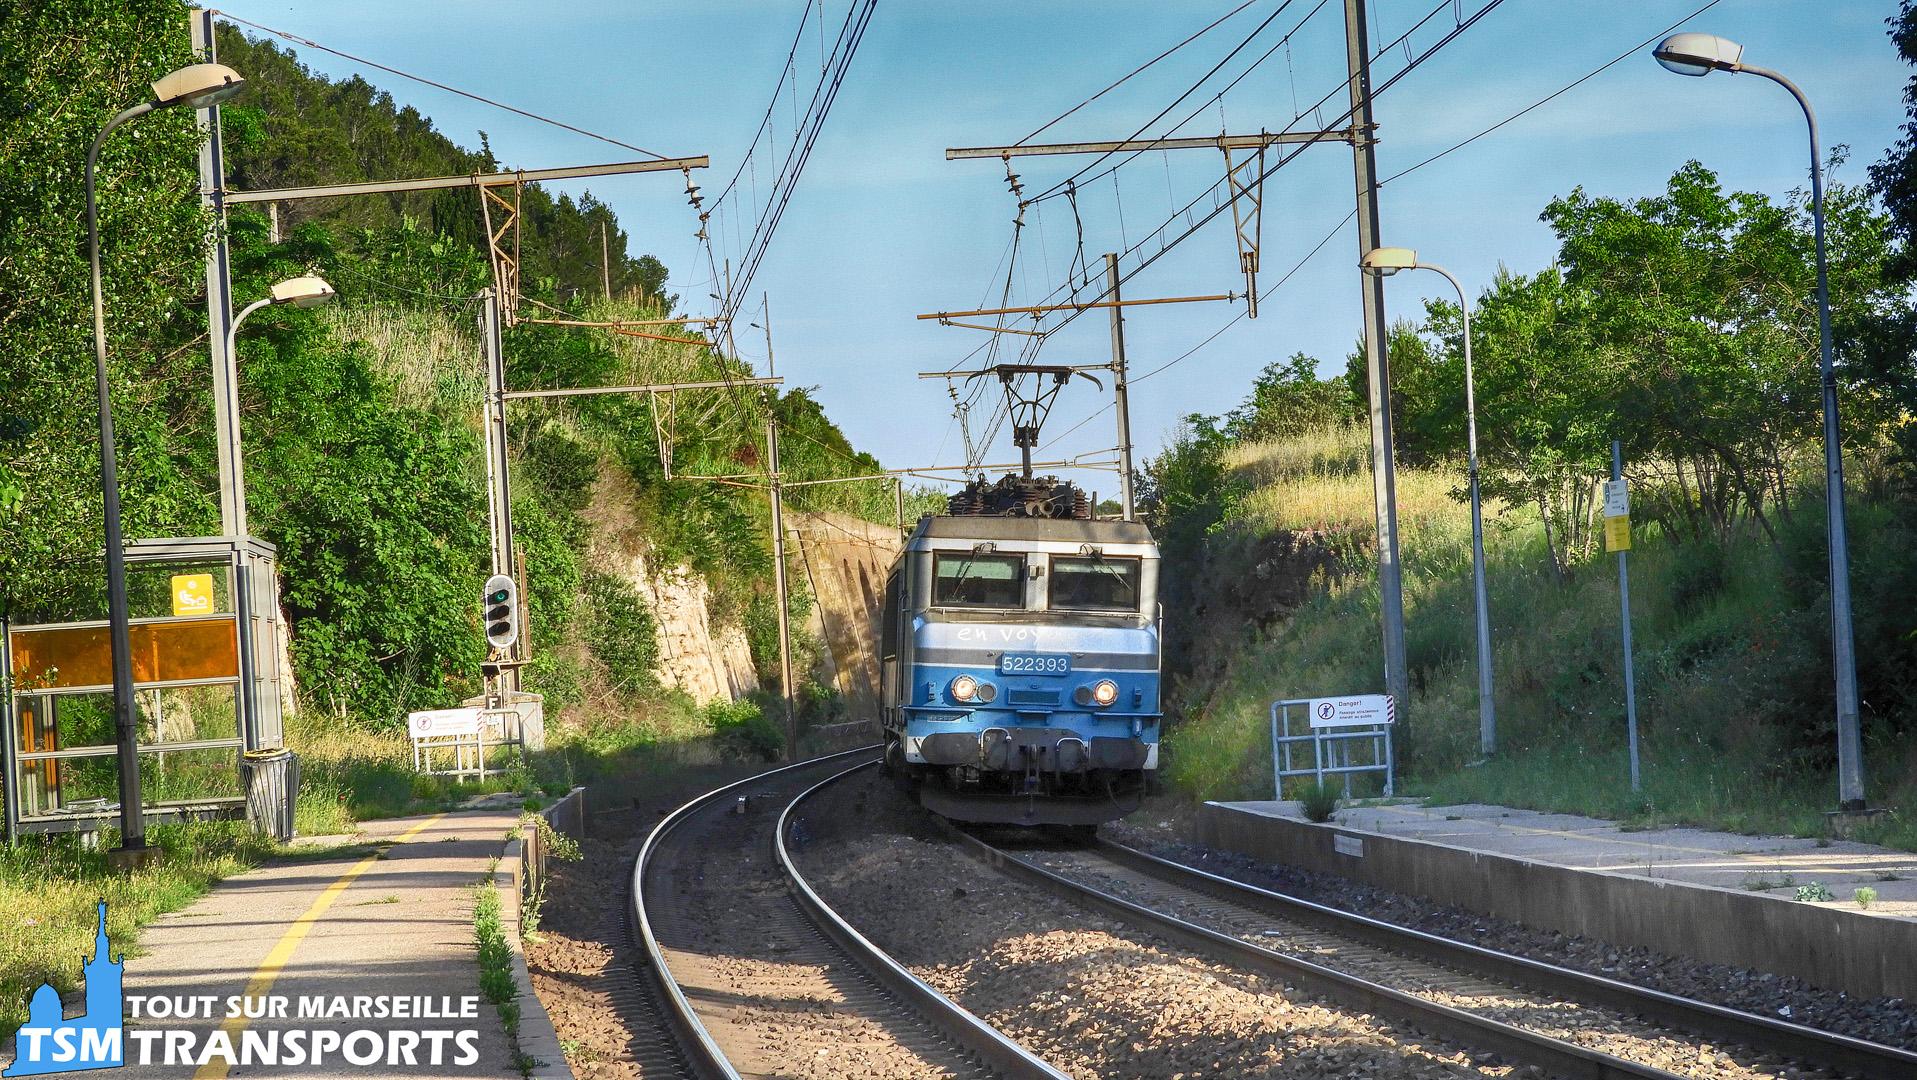 Alstom BB22200 n°22393 SNCF à Saint Chamas